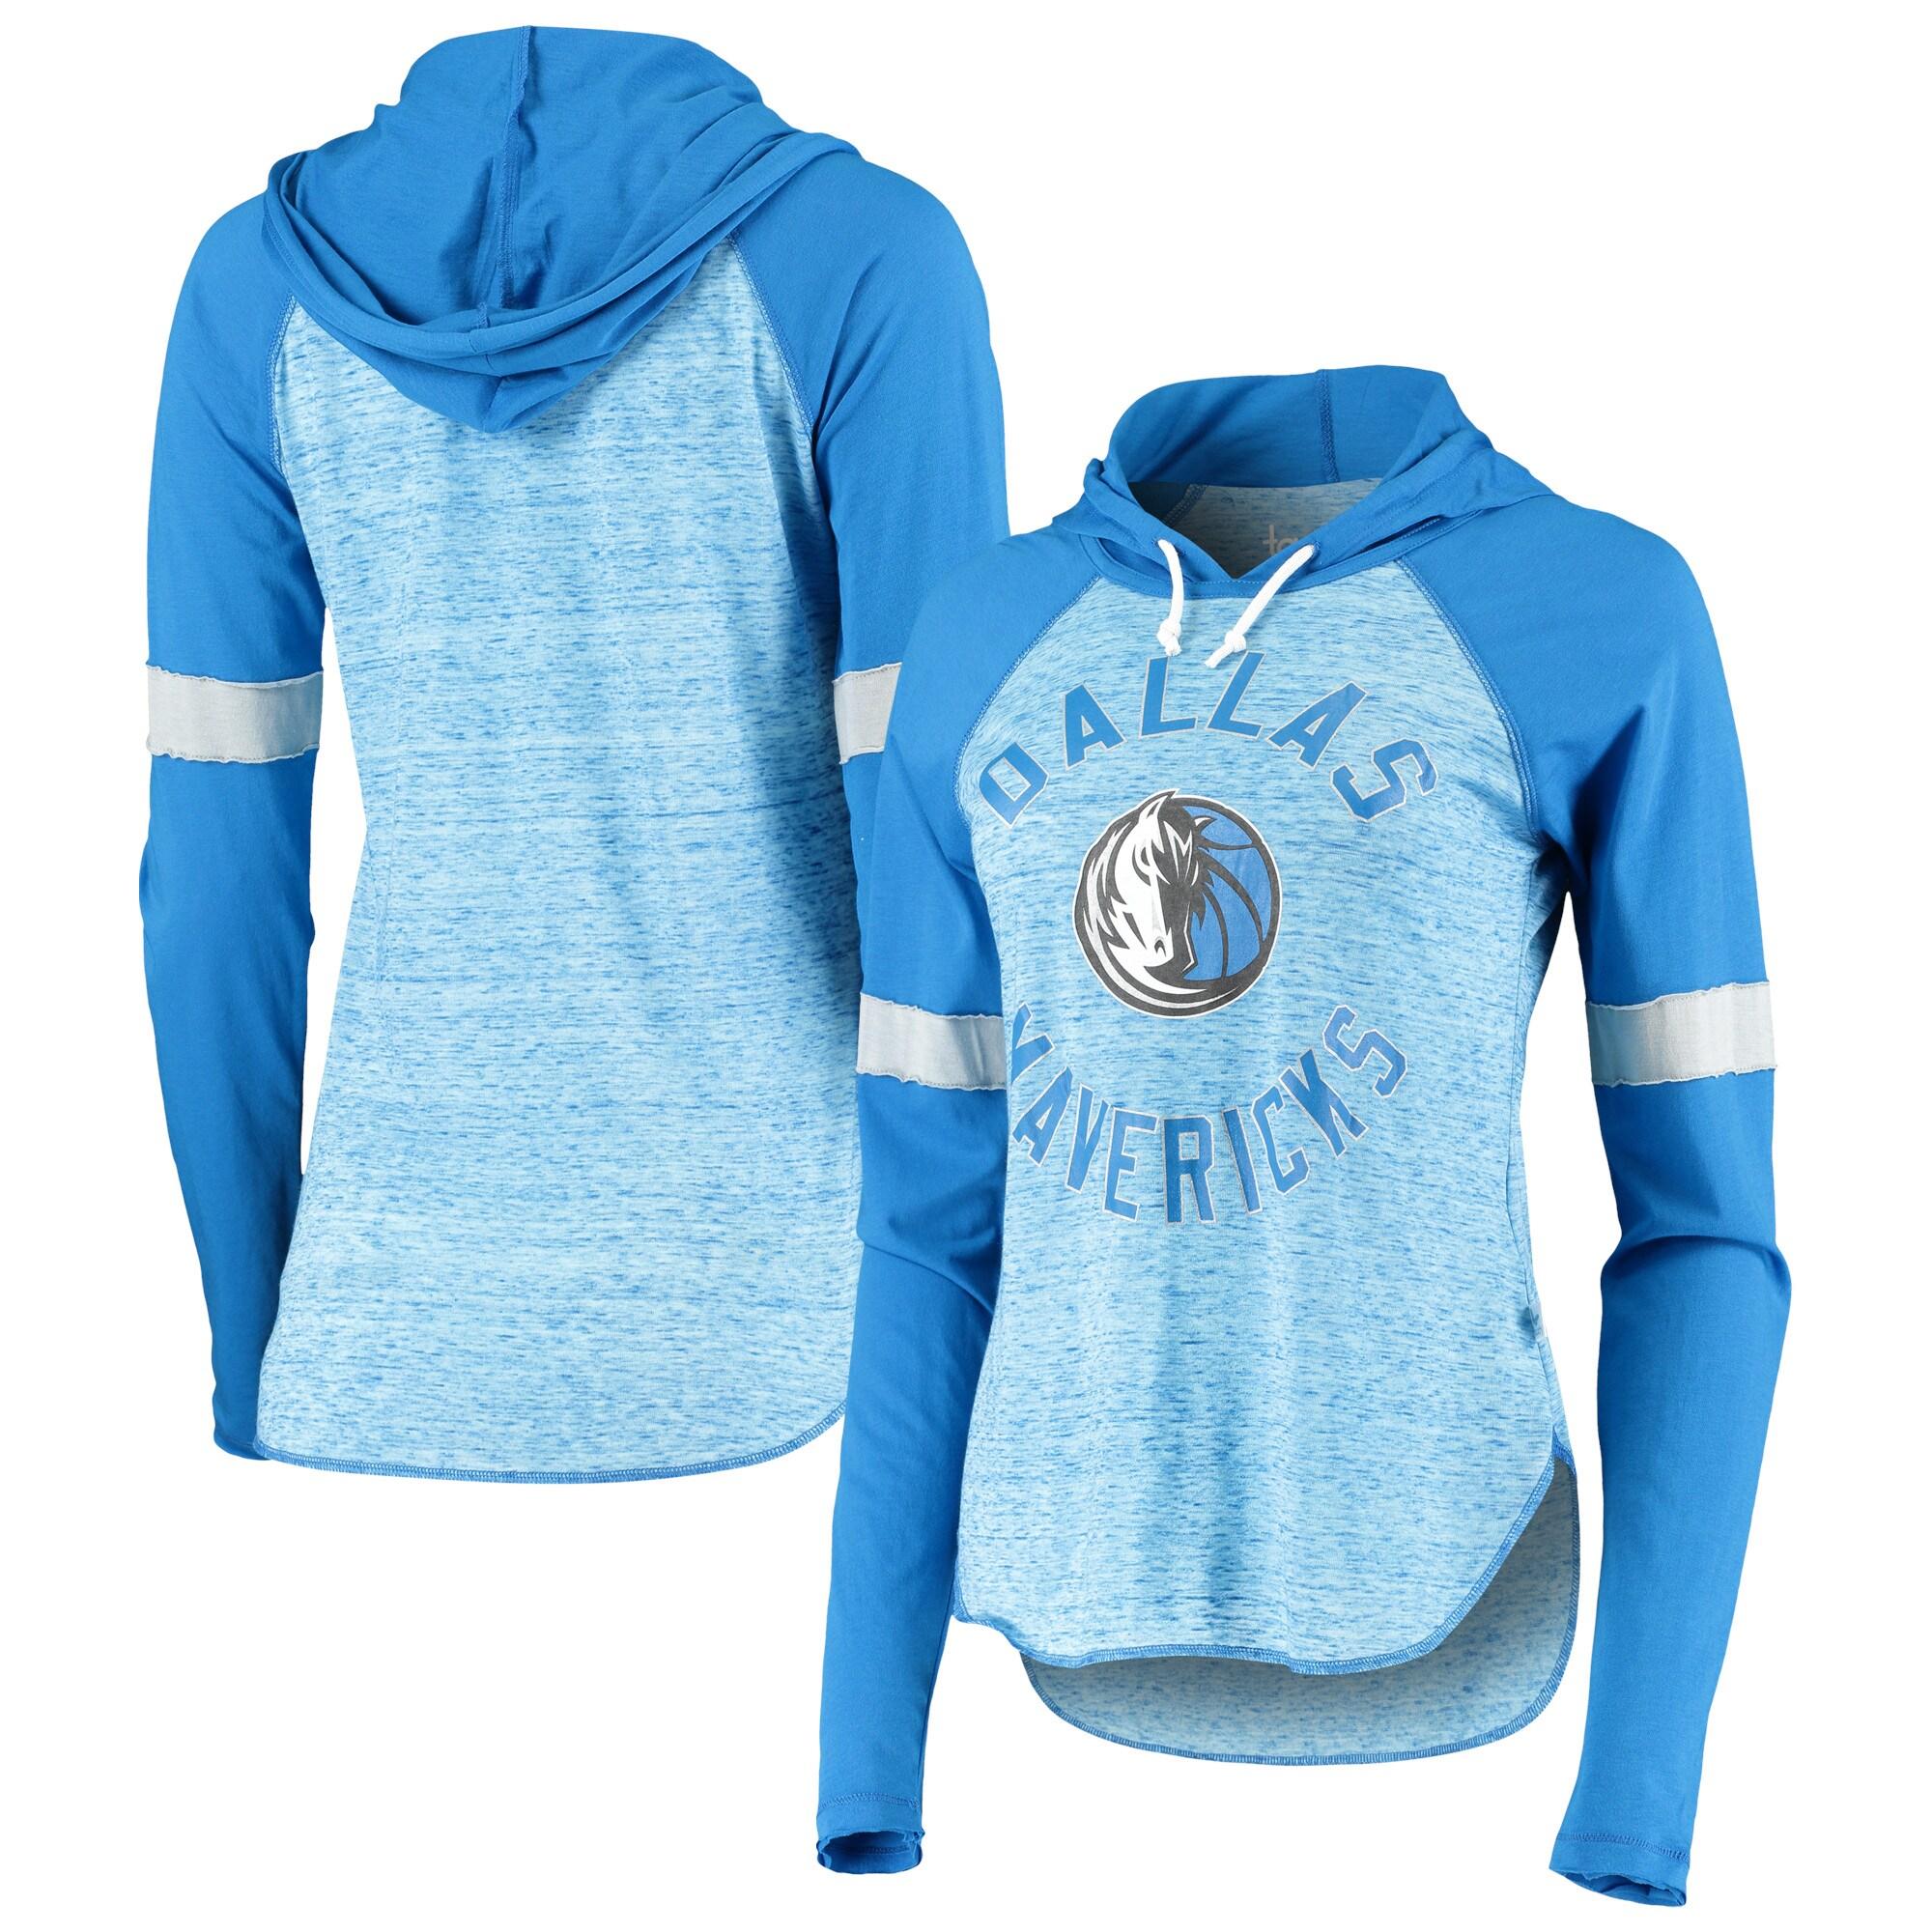 Dallas Mavericks Touch Women's Season Opener Raglan Hoodie Long Sleeve T-Shirt - Blue